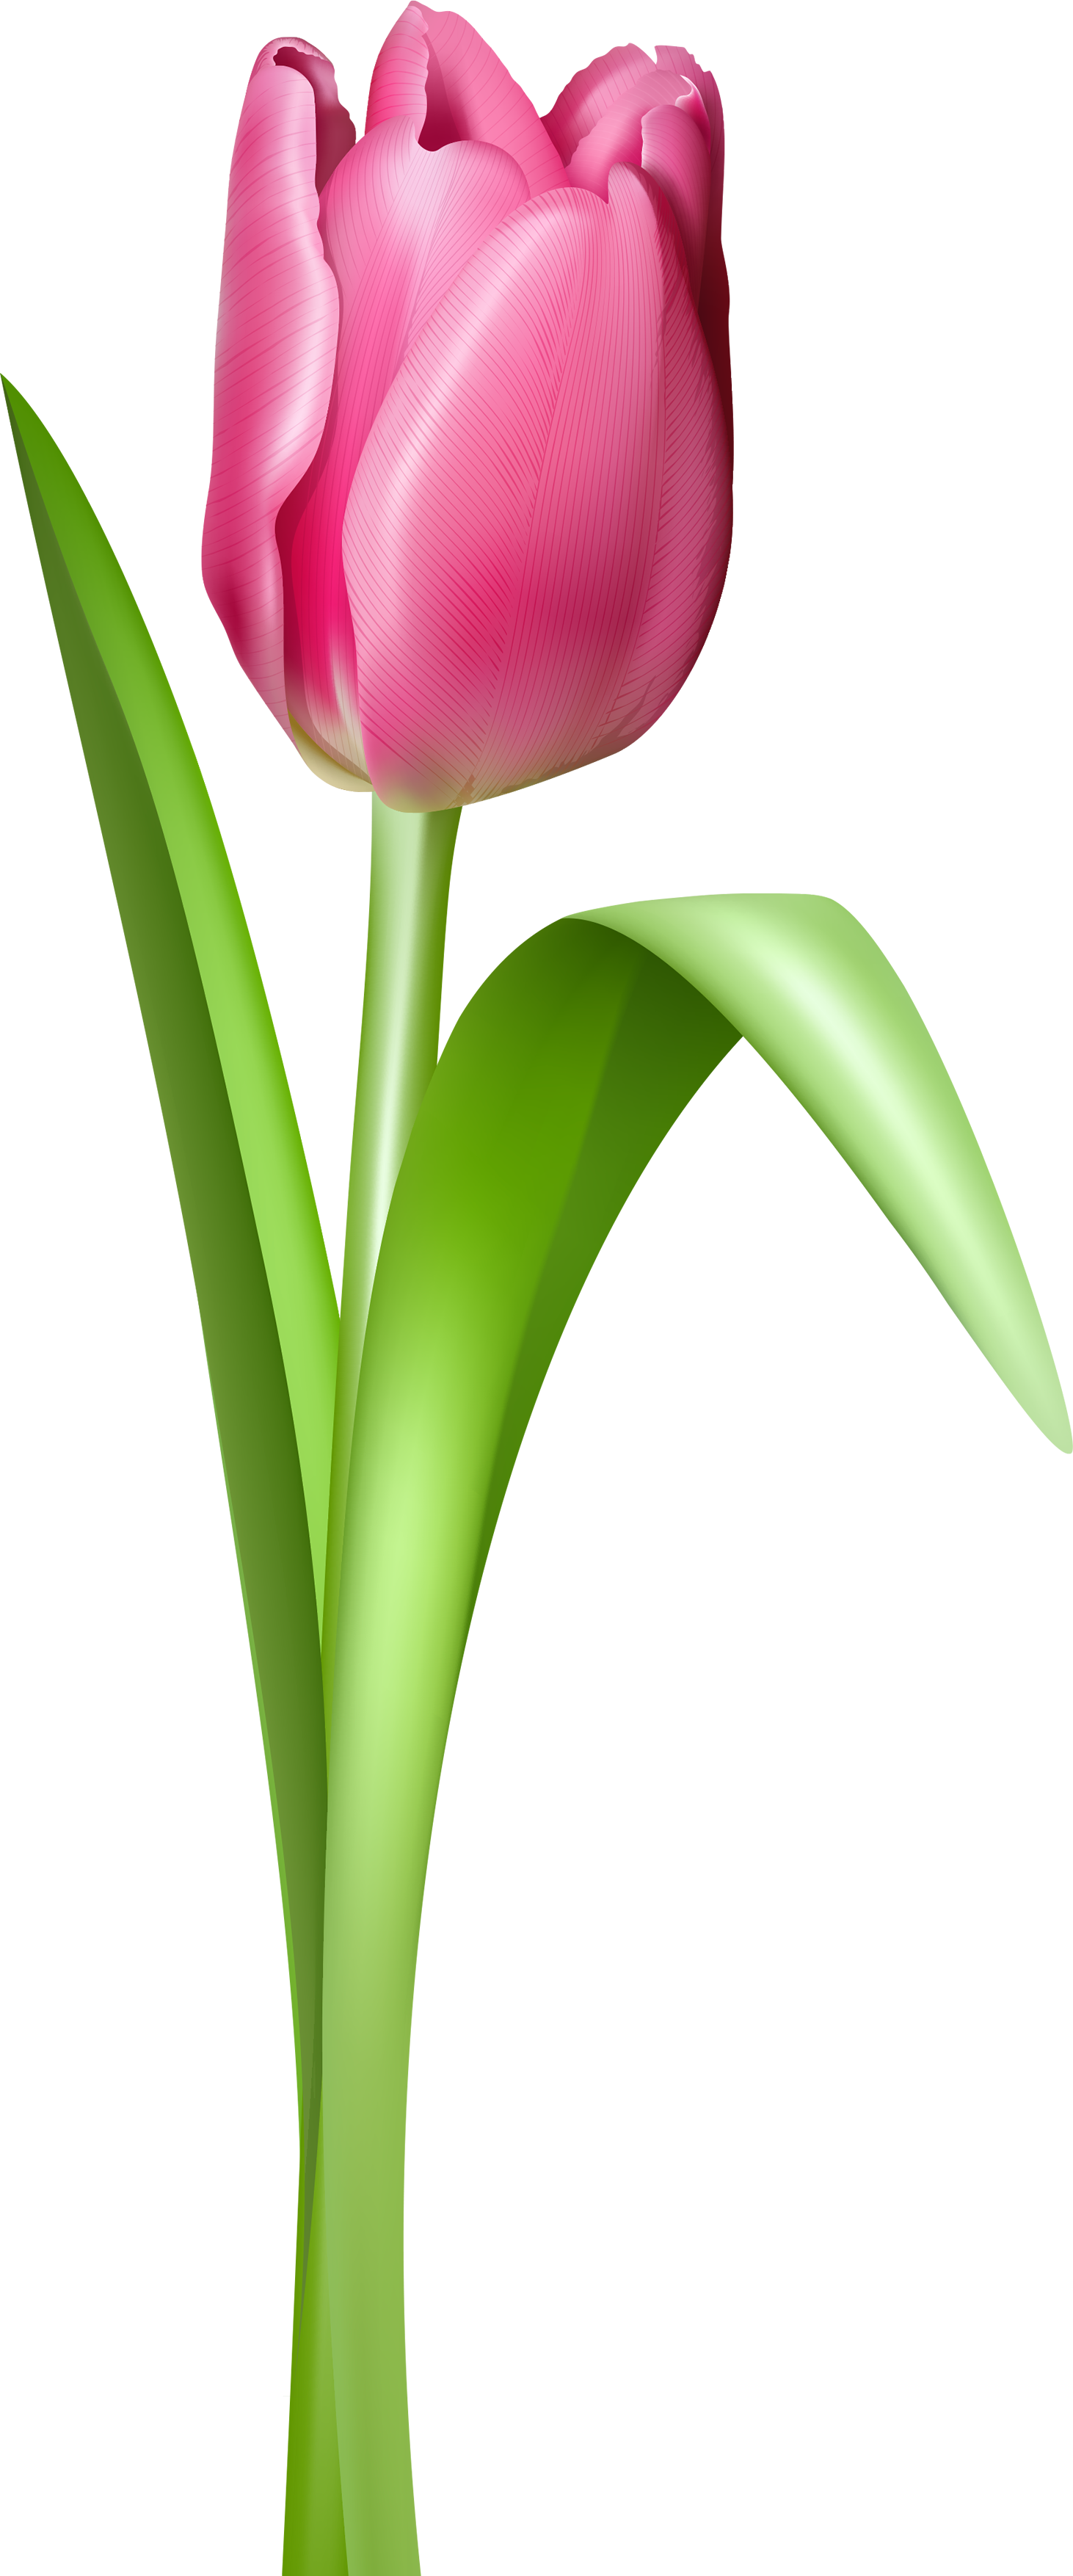 Tulip PNG Image